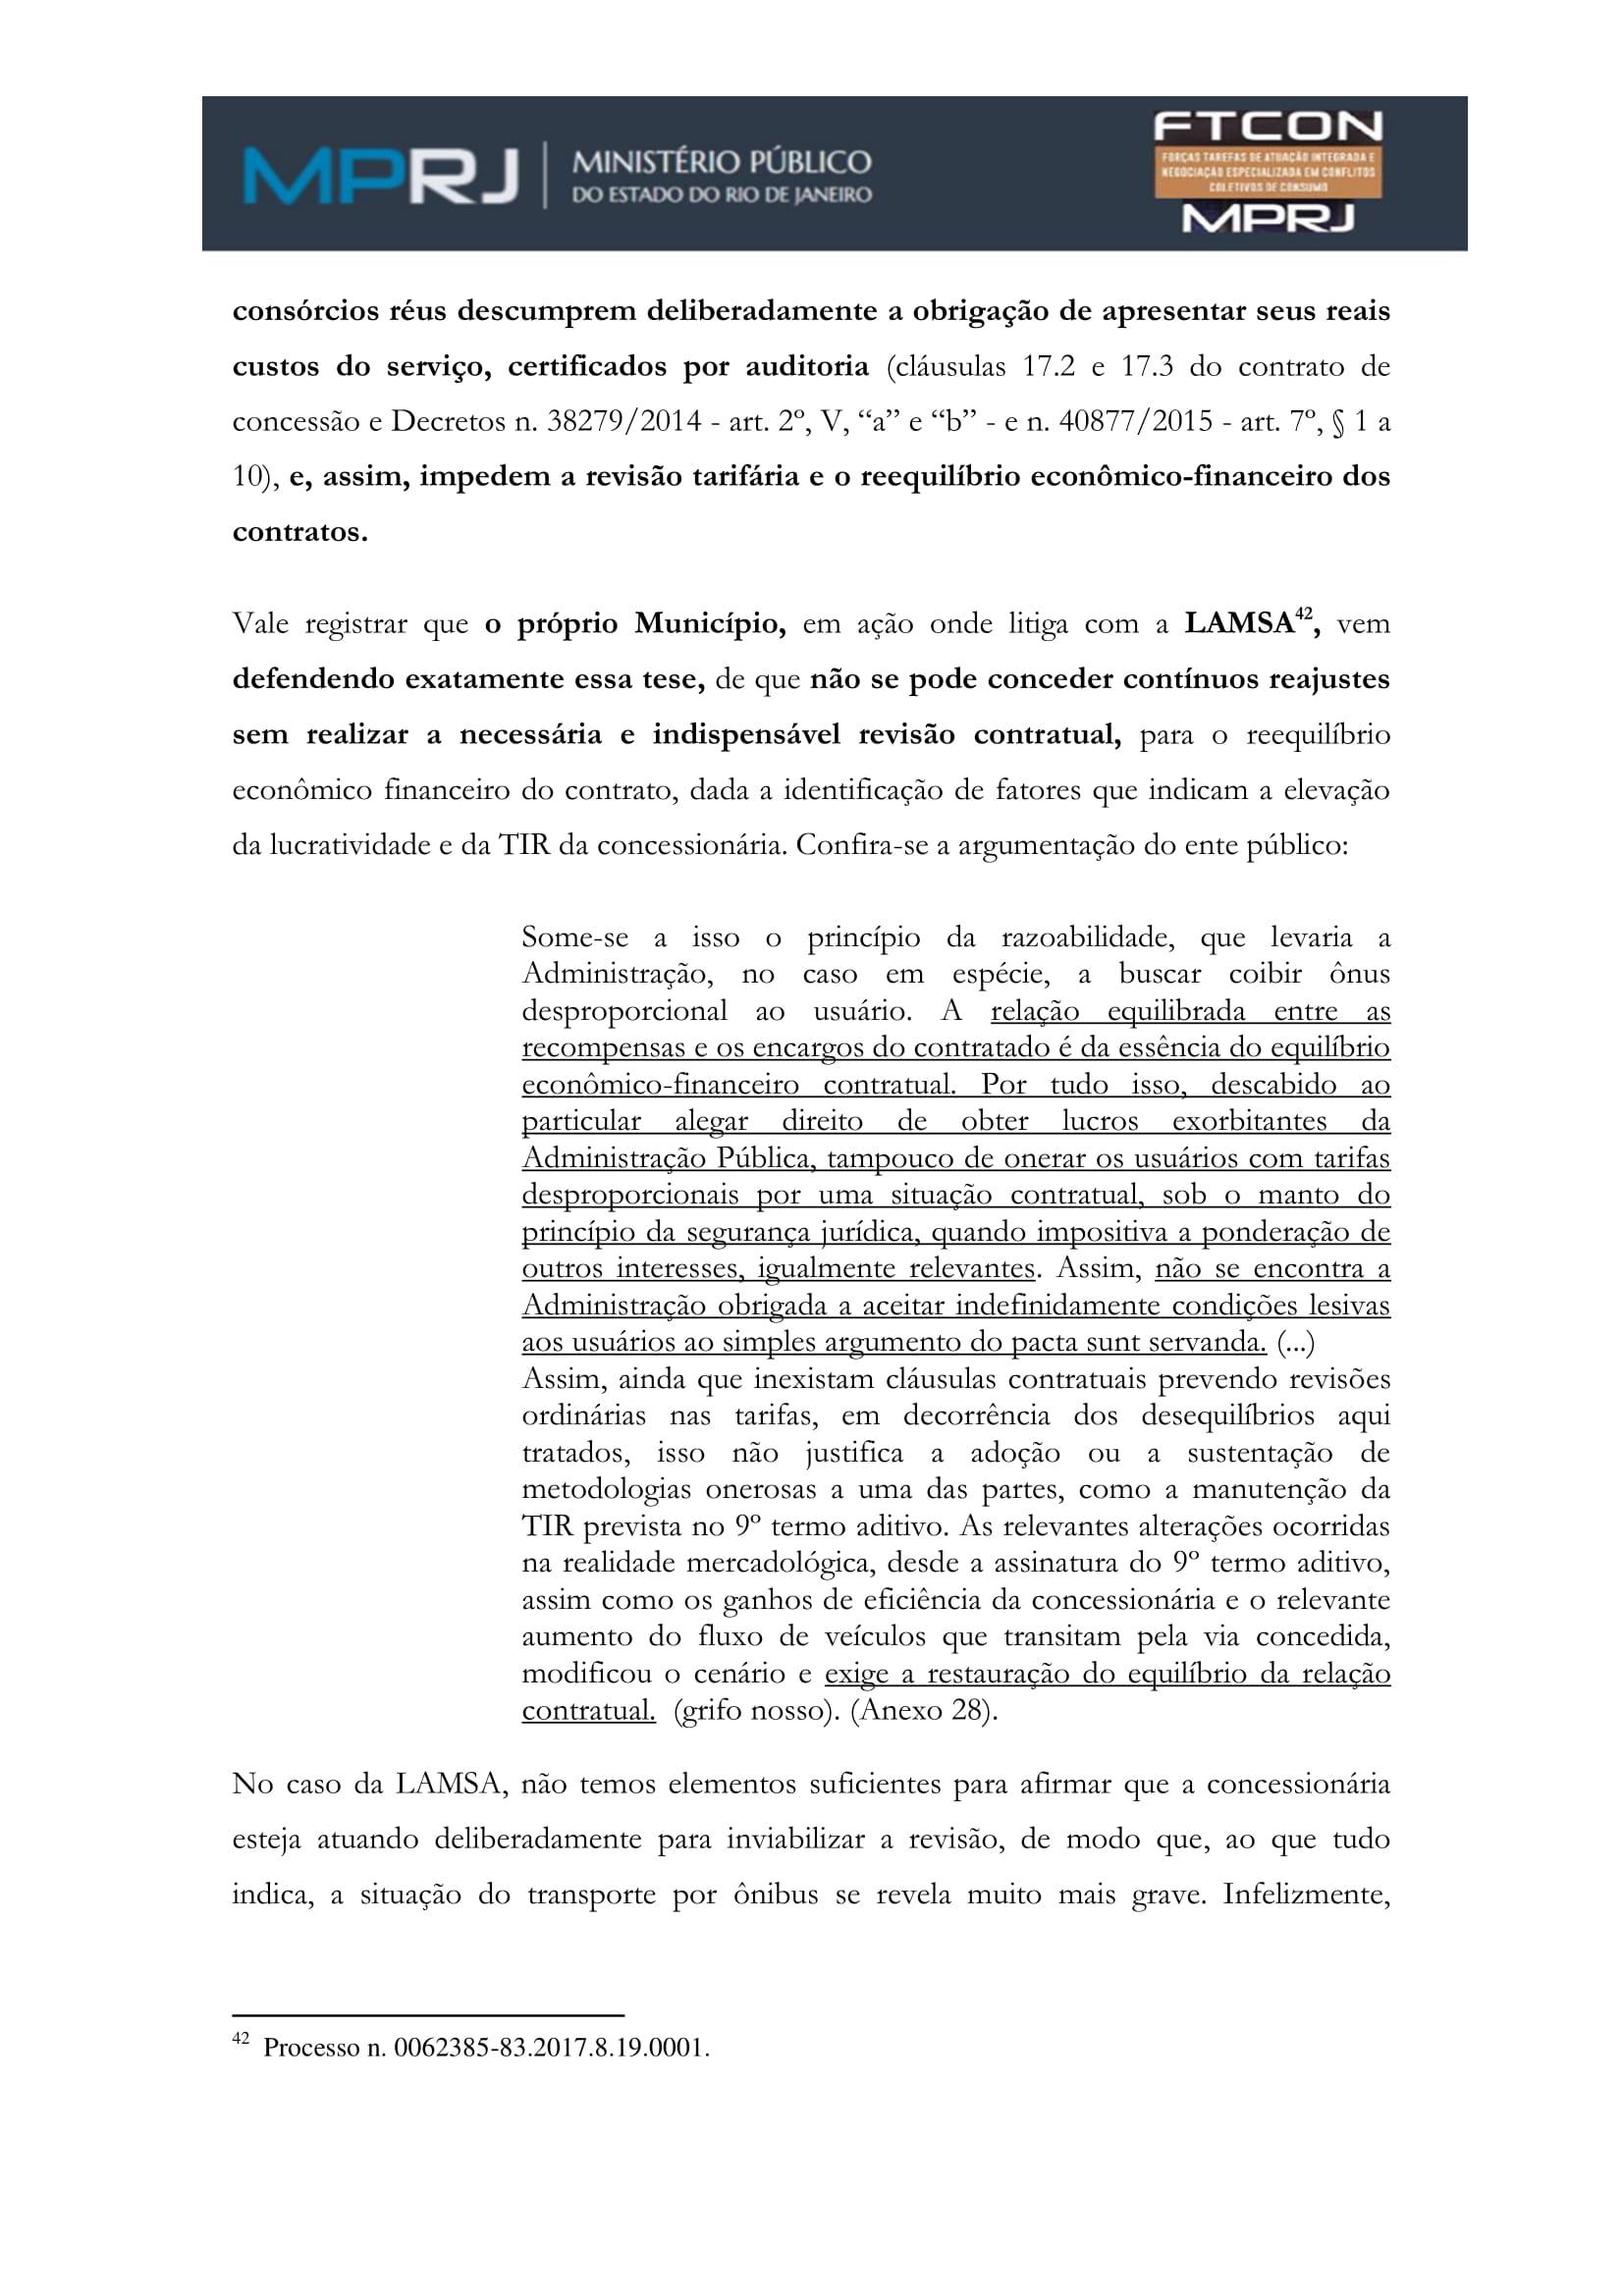 acp_caducidade_onibus_dr_rt-053